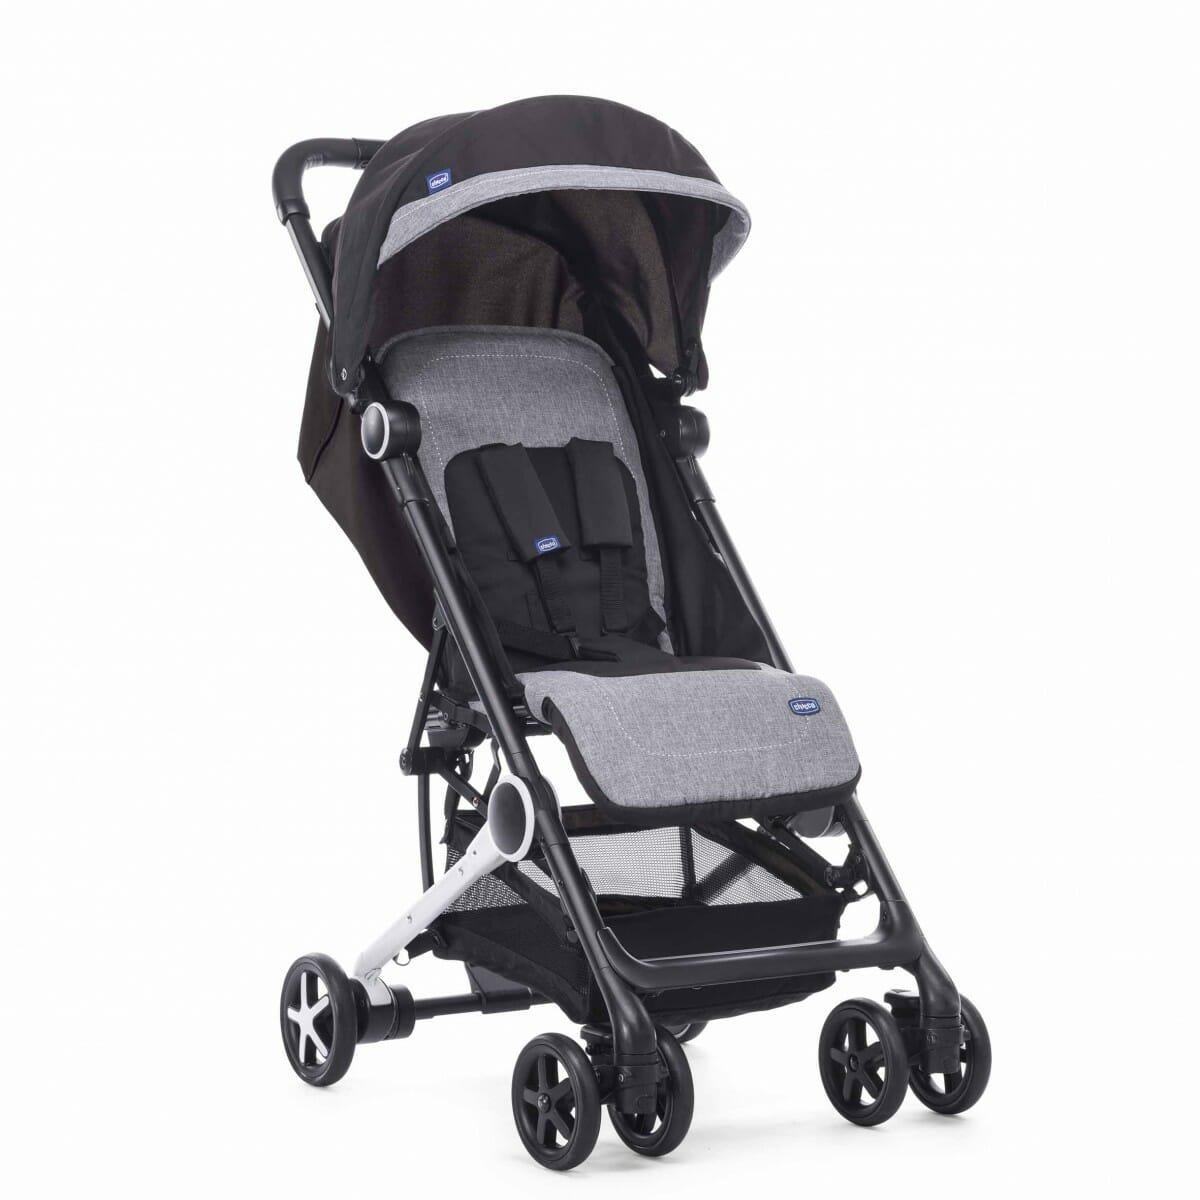 Chicco Miinimo Compact Travel Stroller Black